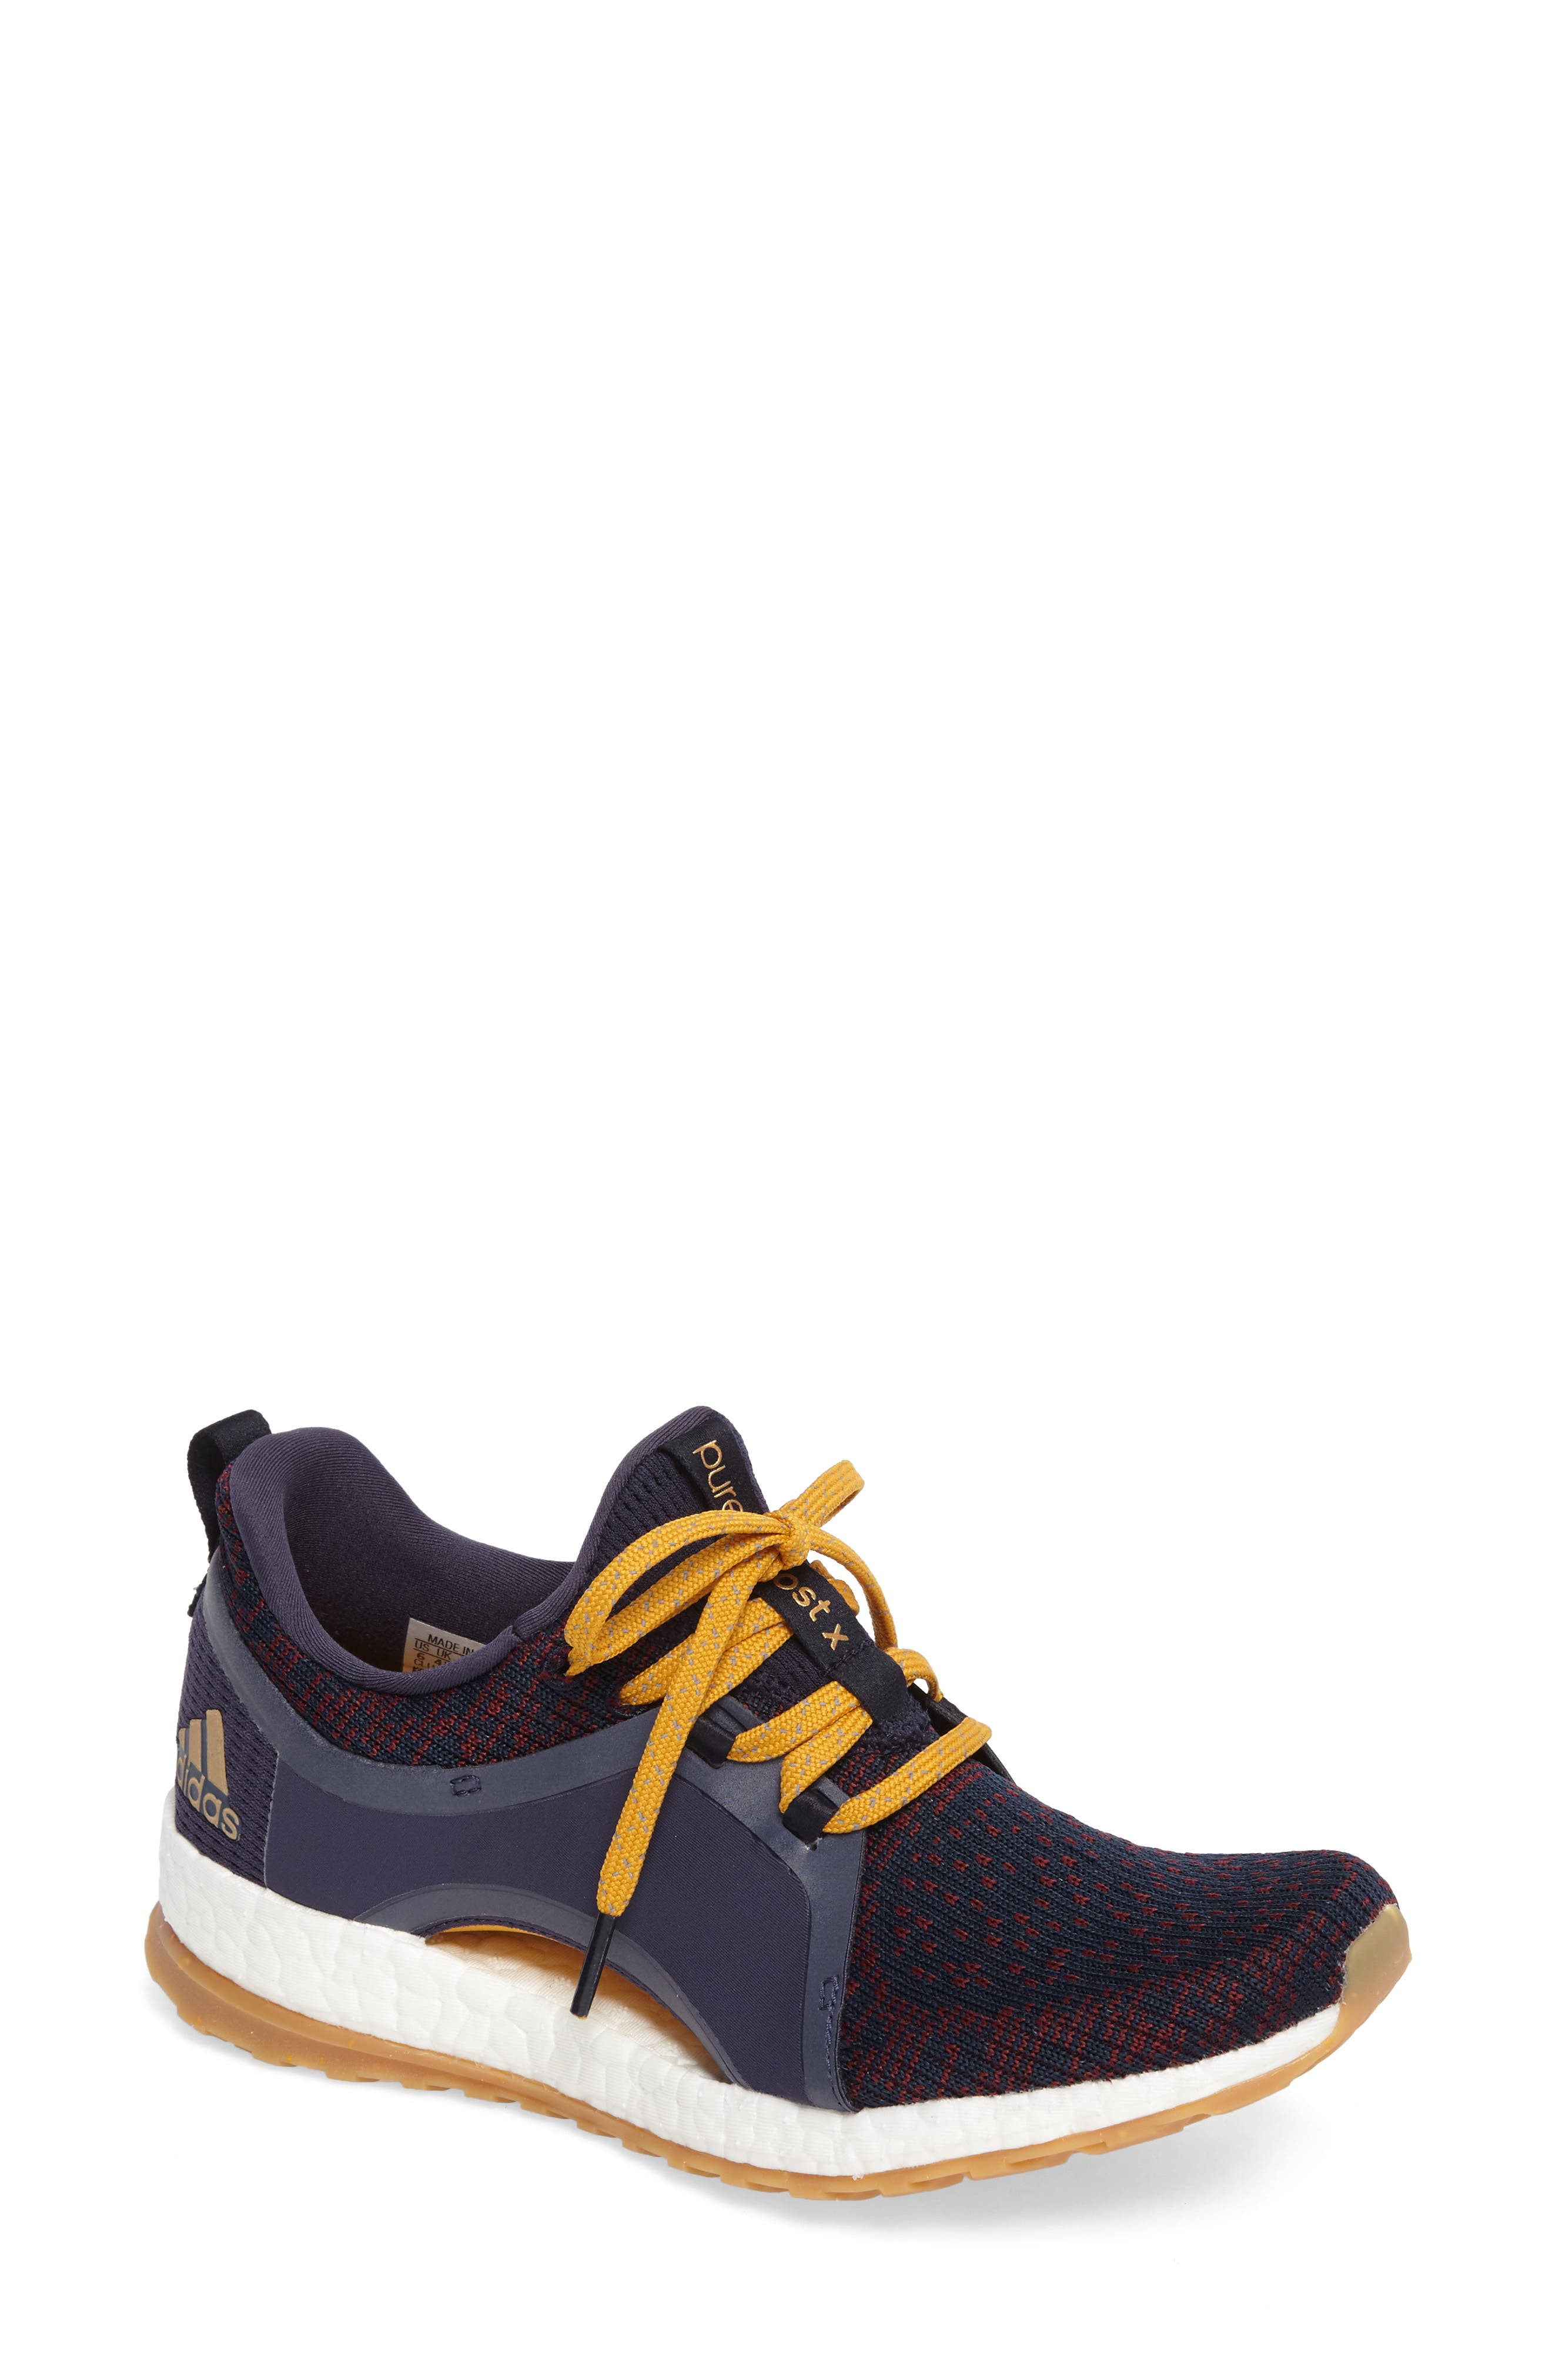 PureBoost X ATR Running Shoe,                             Main thumbnail 1, color,                             408